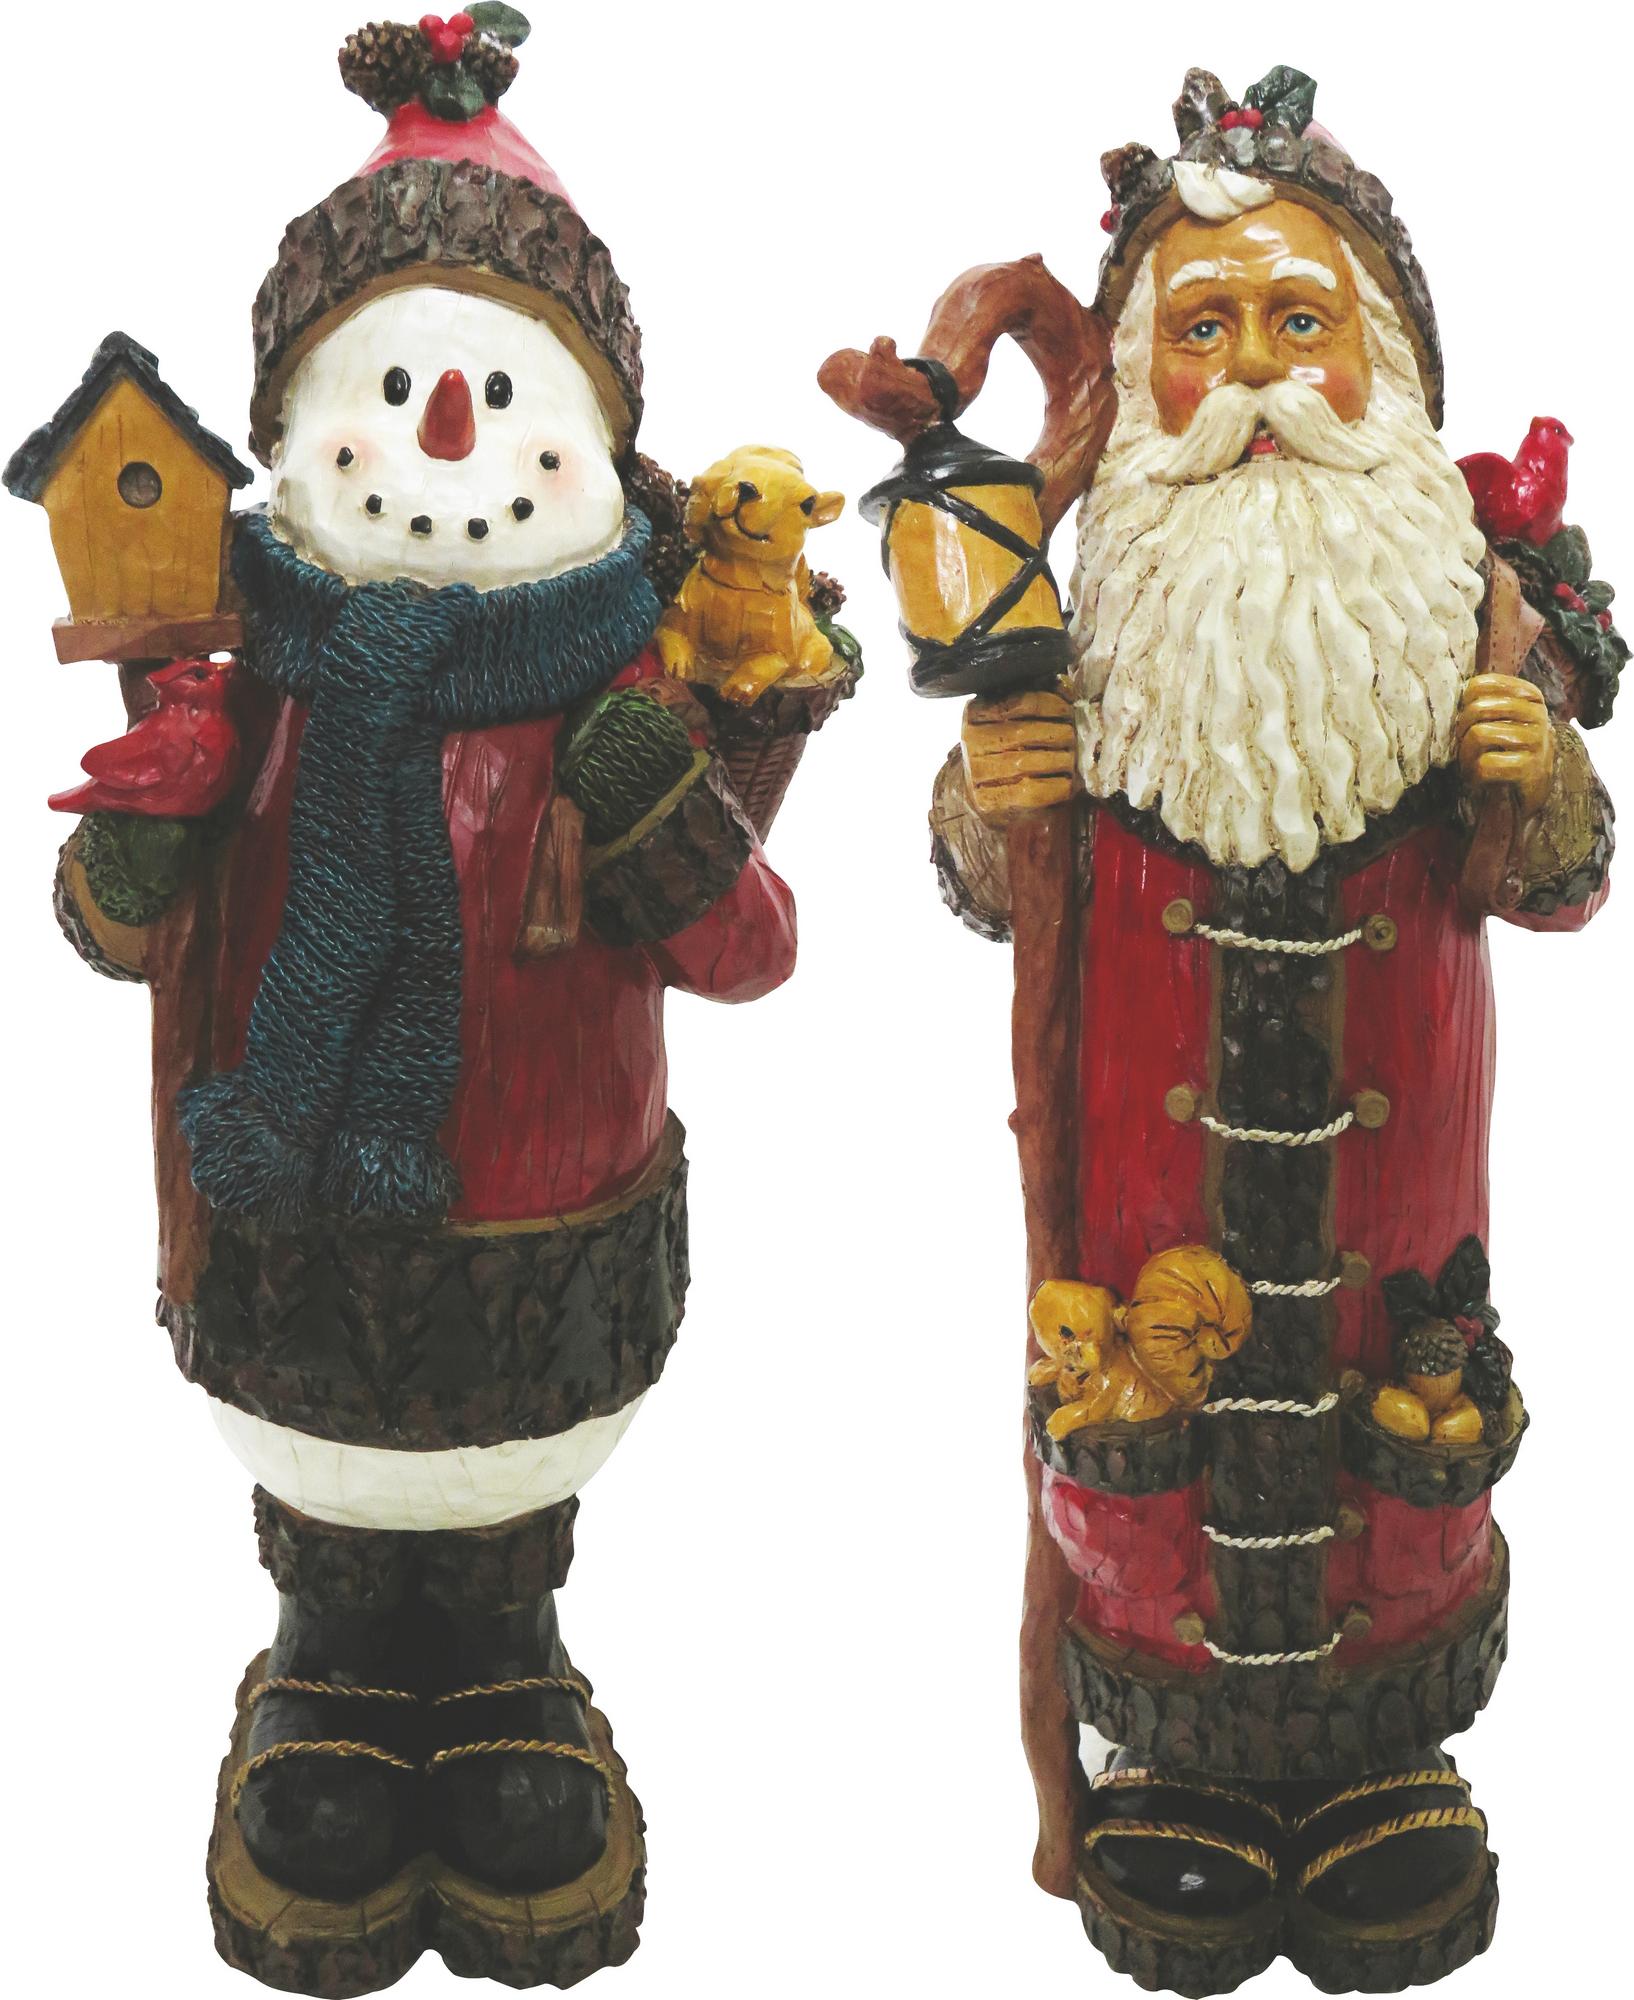 Santa & Snowman Christmas Statues